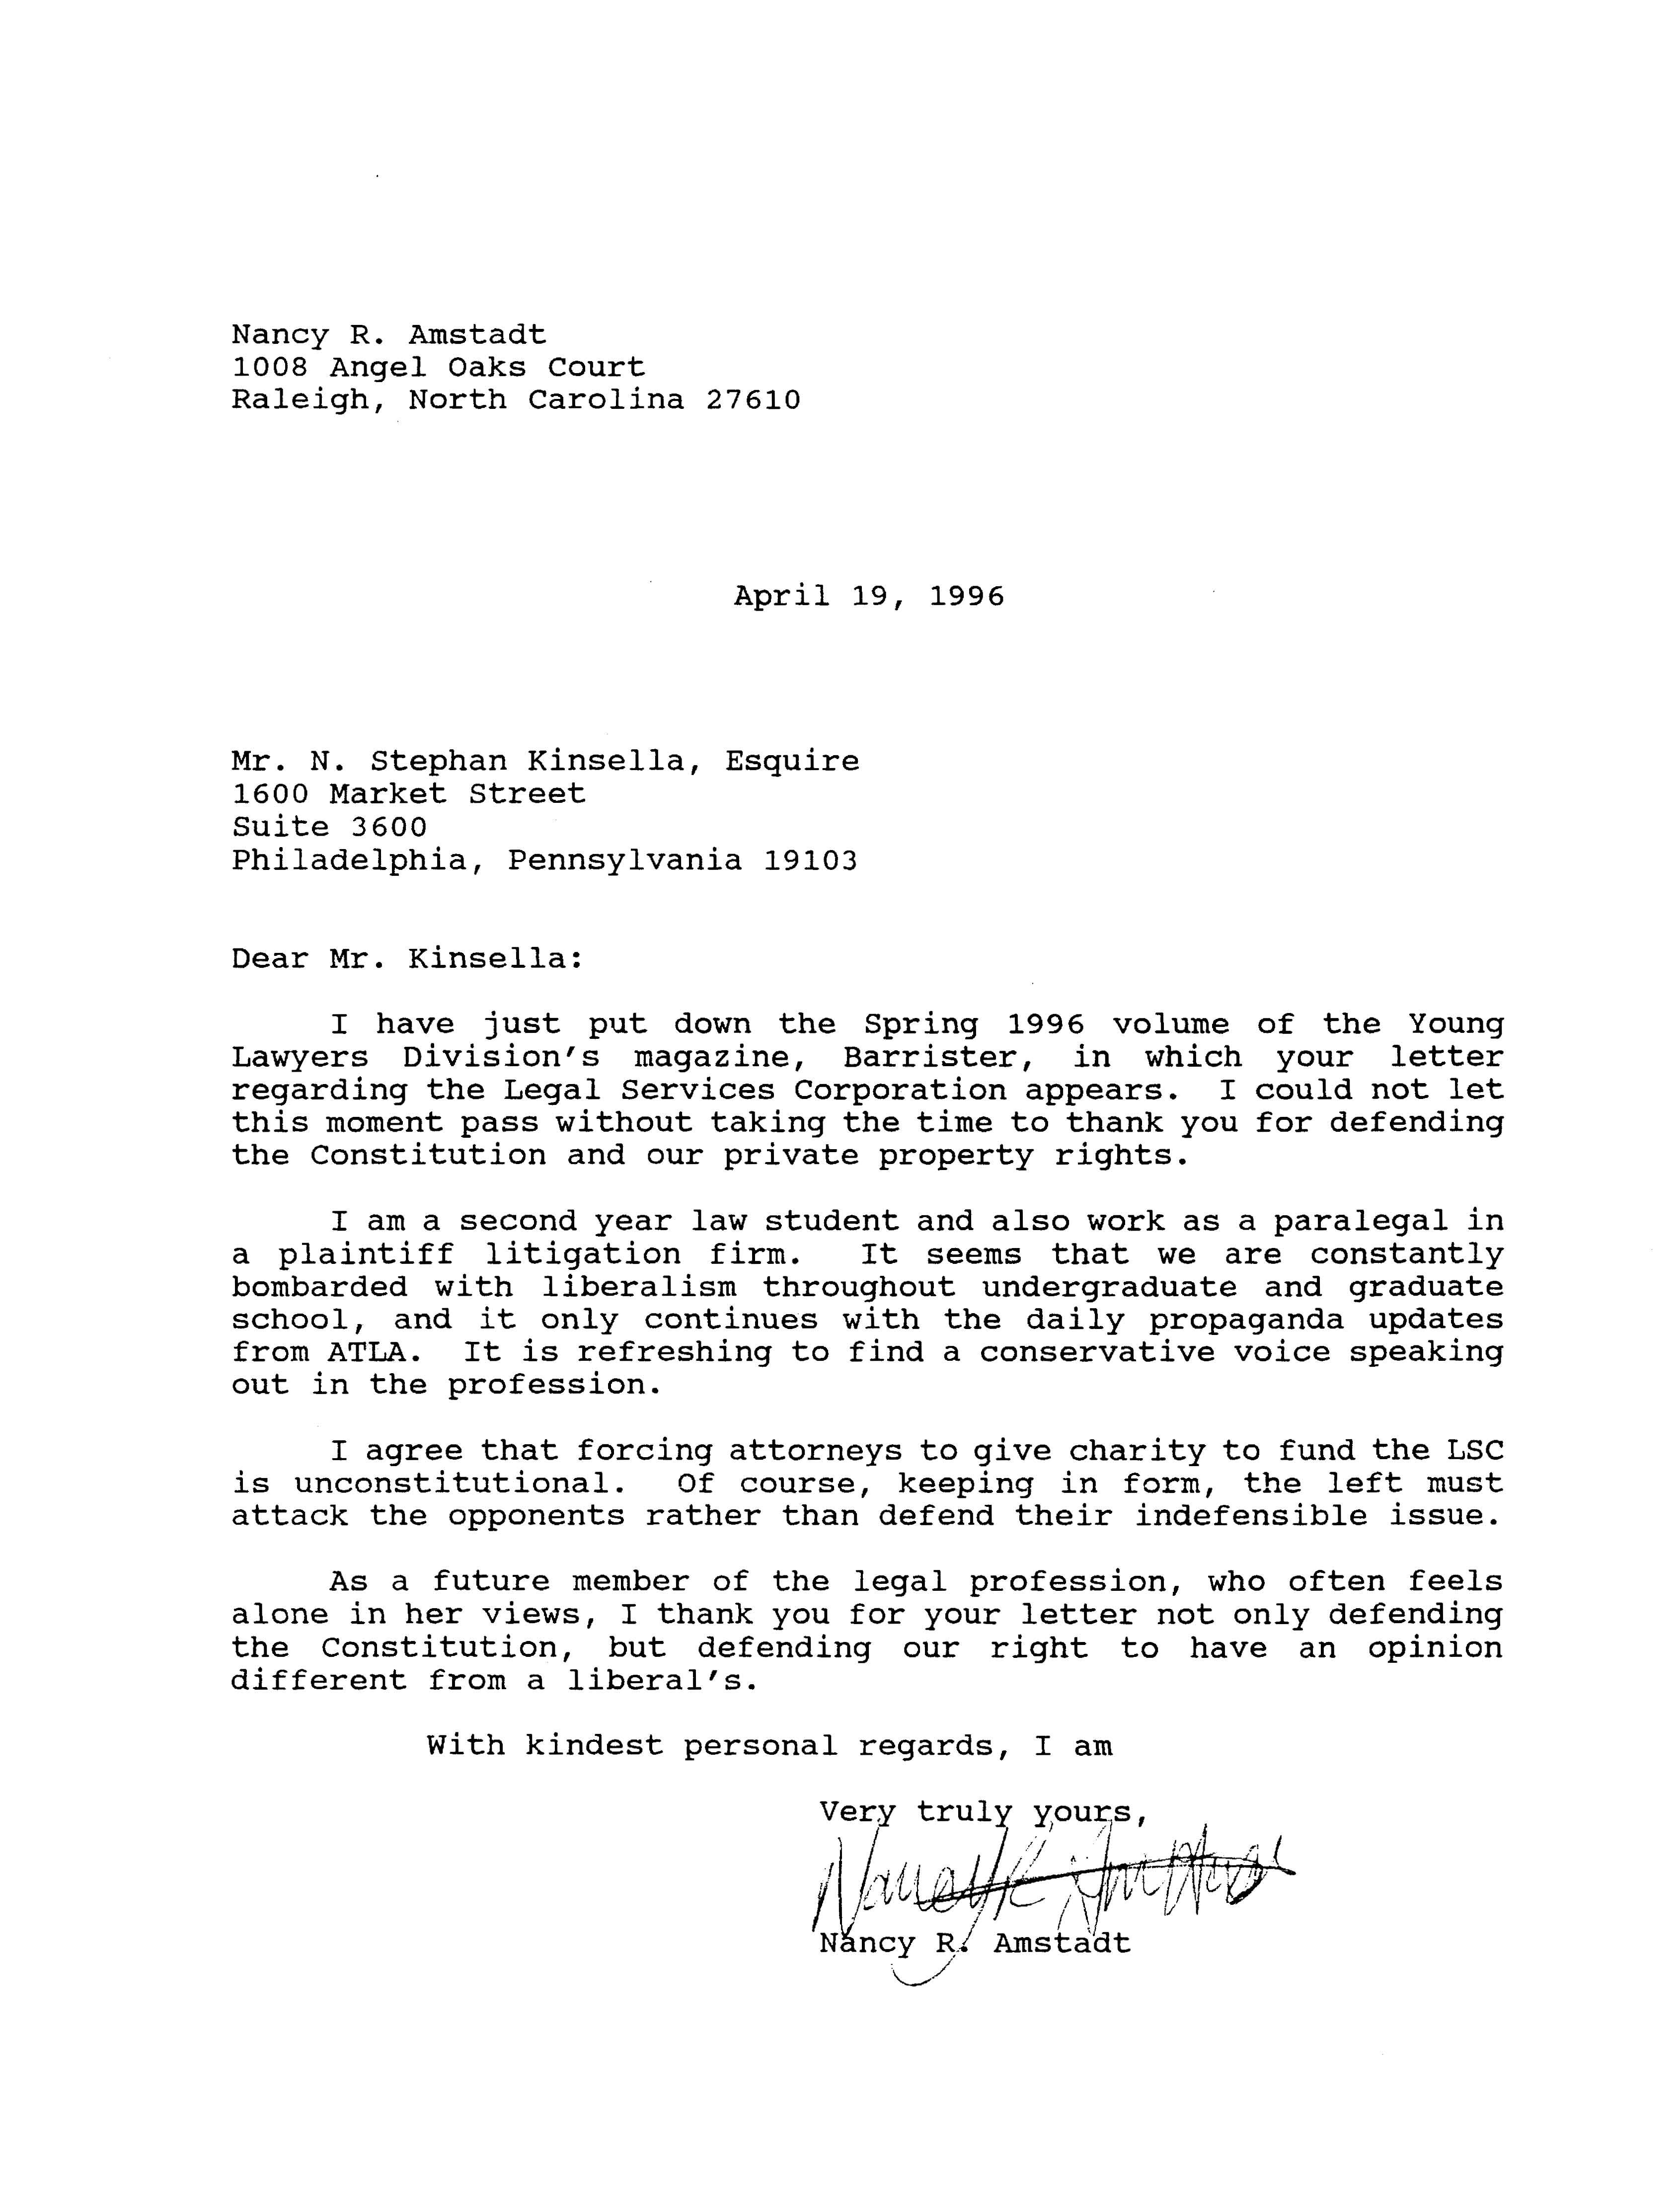 Image Result For Resignation Letter Template